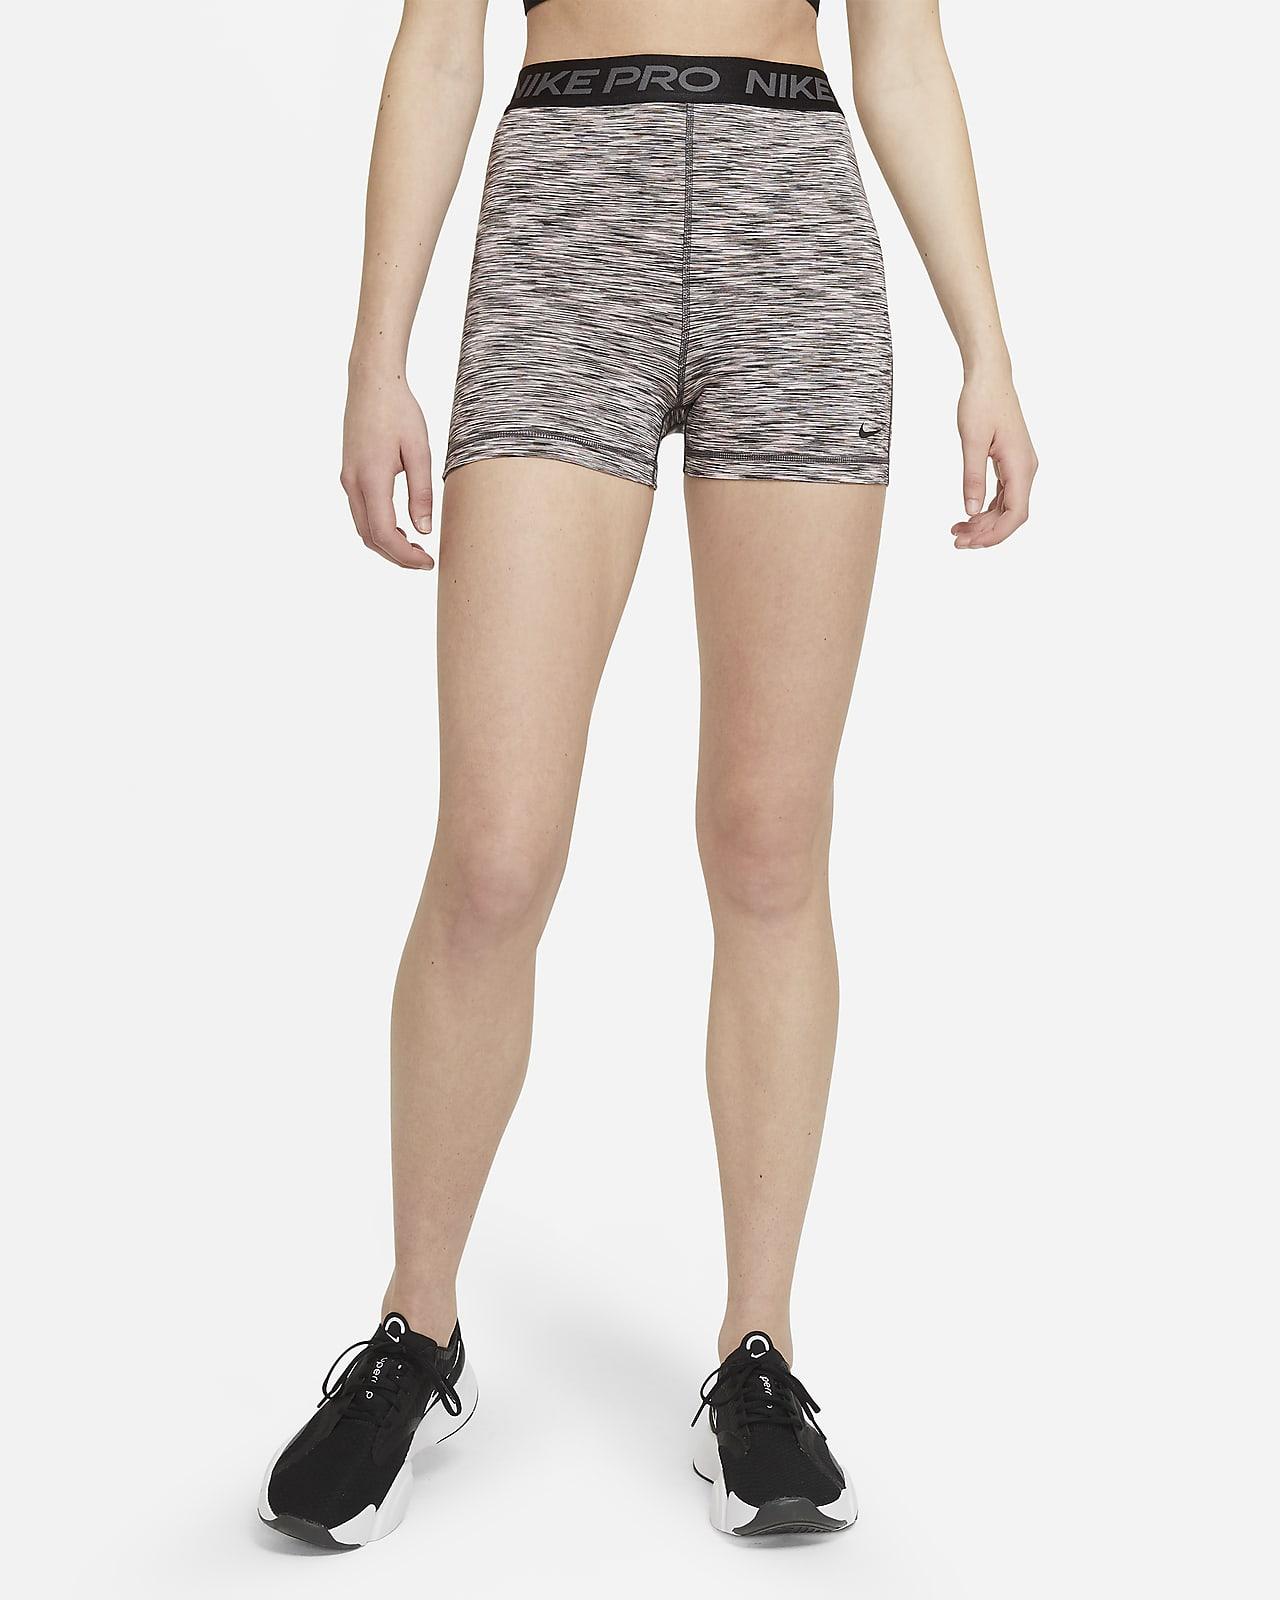 Shorts de teñido Space-Dye de 5 cm para mujer Nike Pro